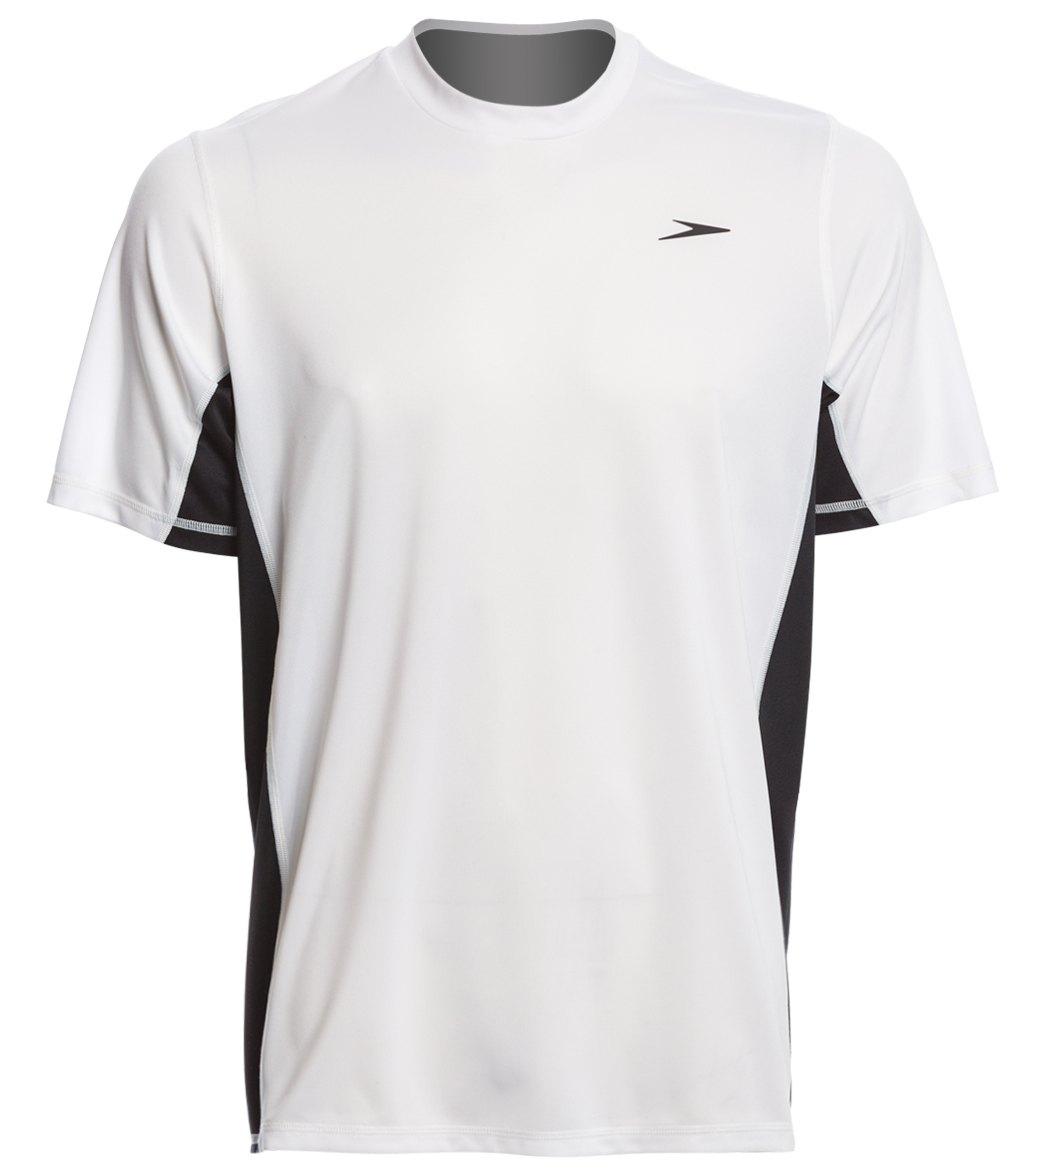 8770a5e987 Nike Men's Heather Short Sleeve Hydro Rash Guard. $23.99 - $38.00$38.00.  Speedo Men's Longview S/S Swim Tee